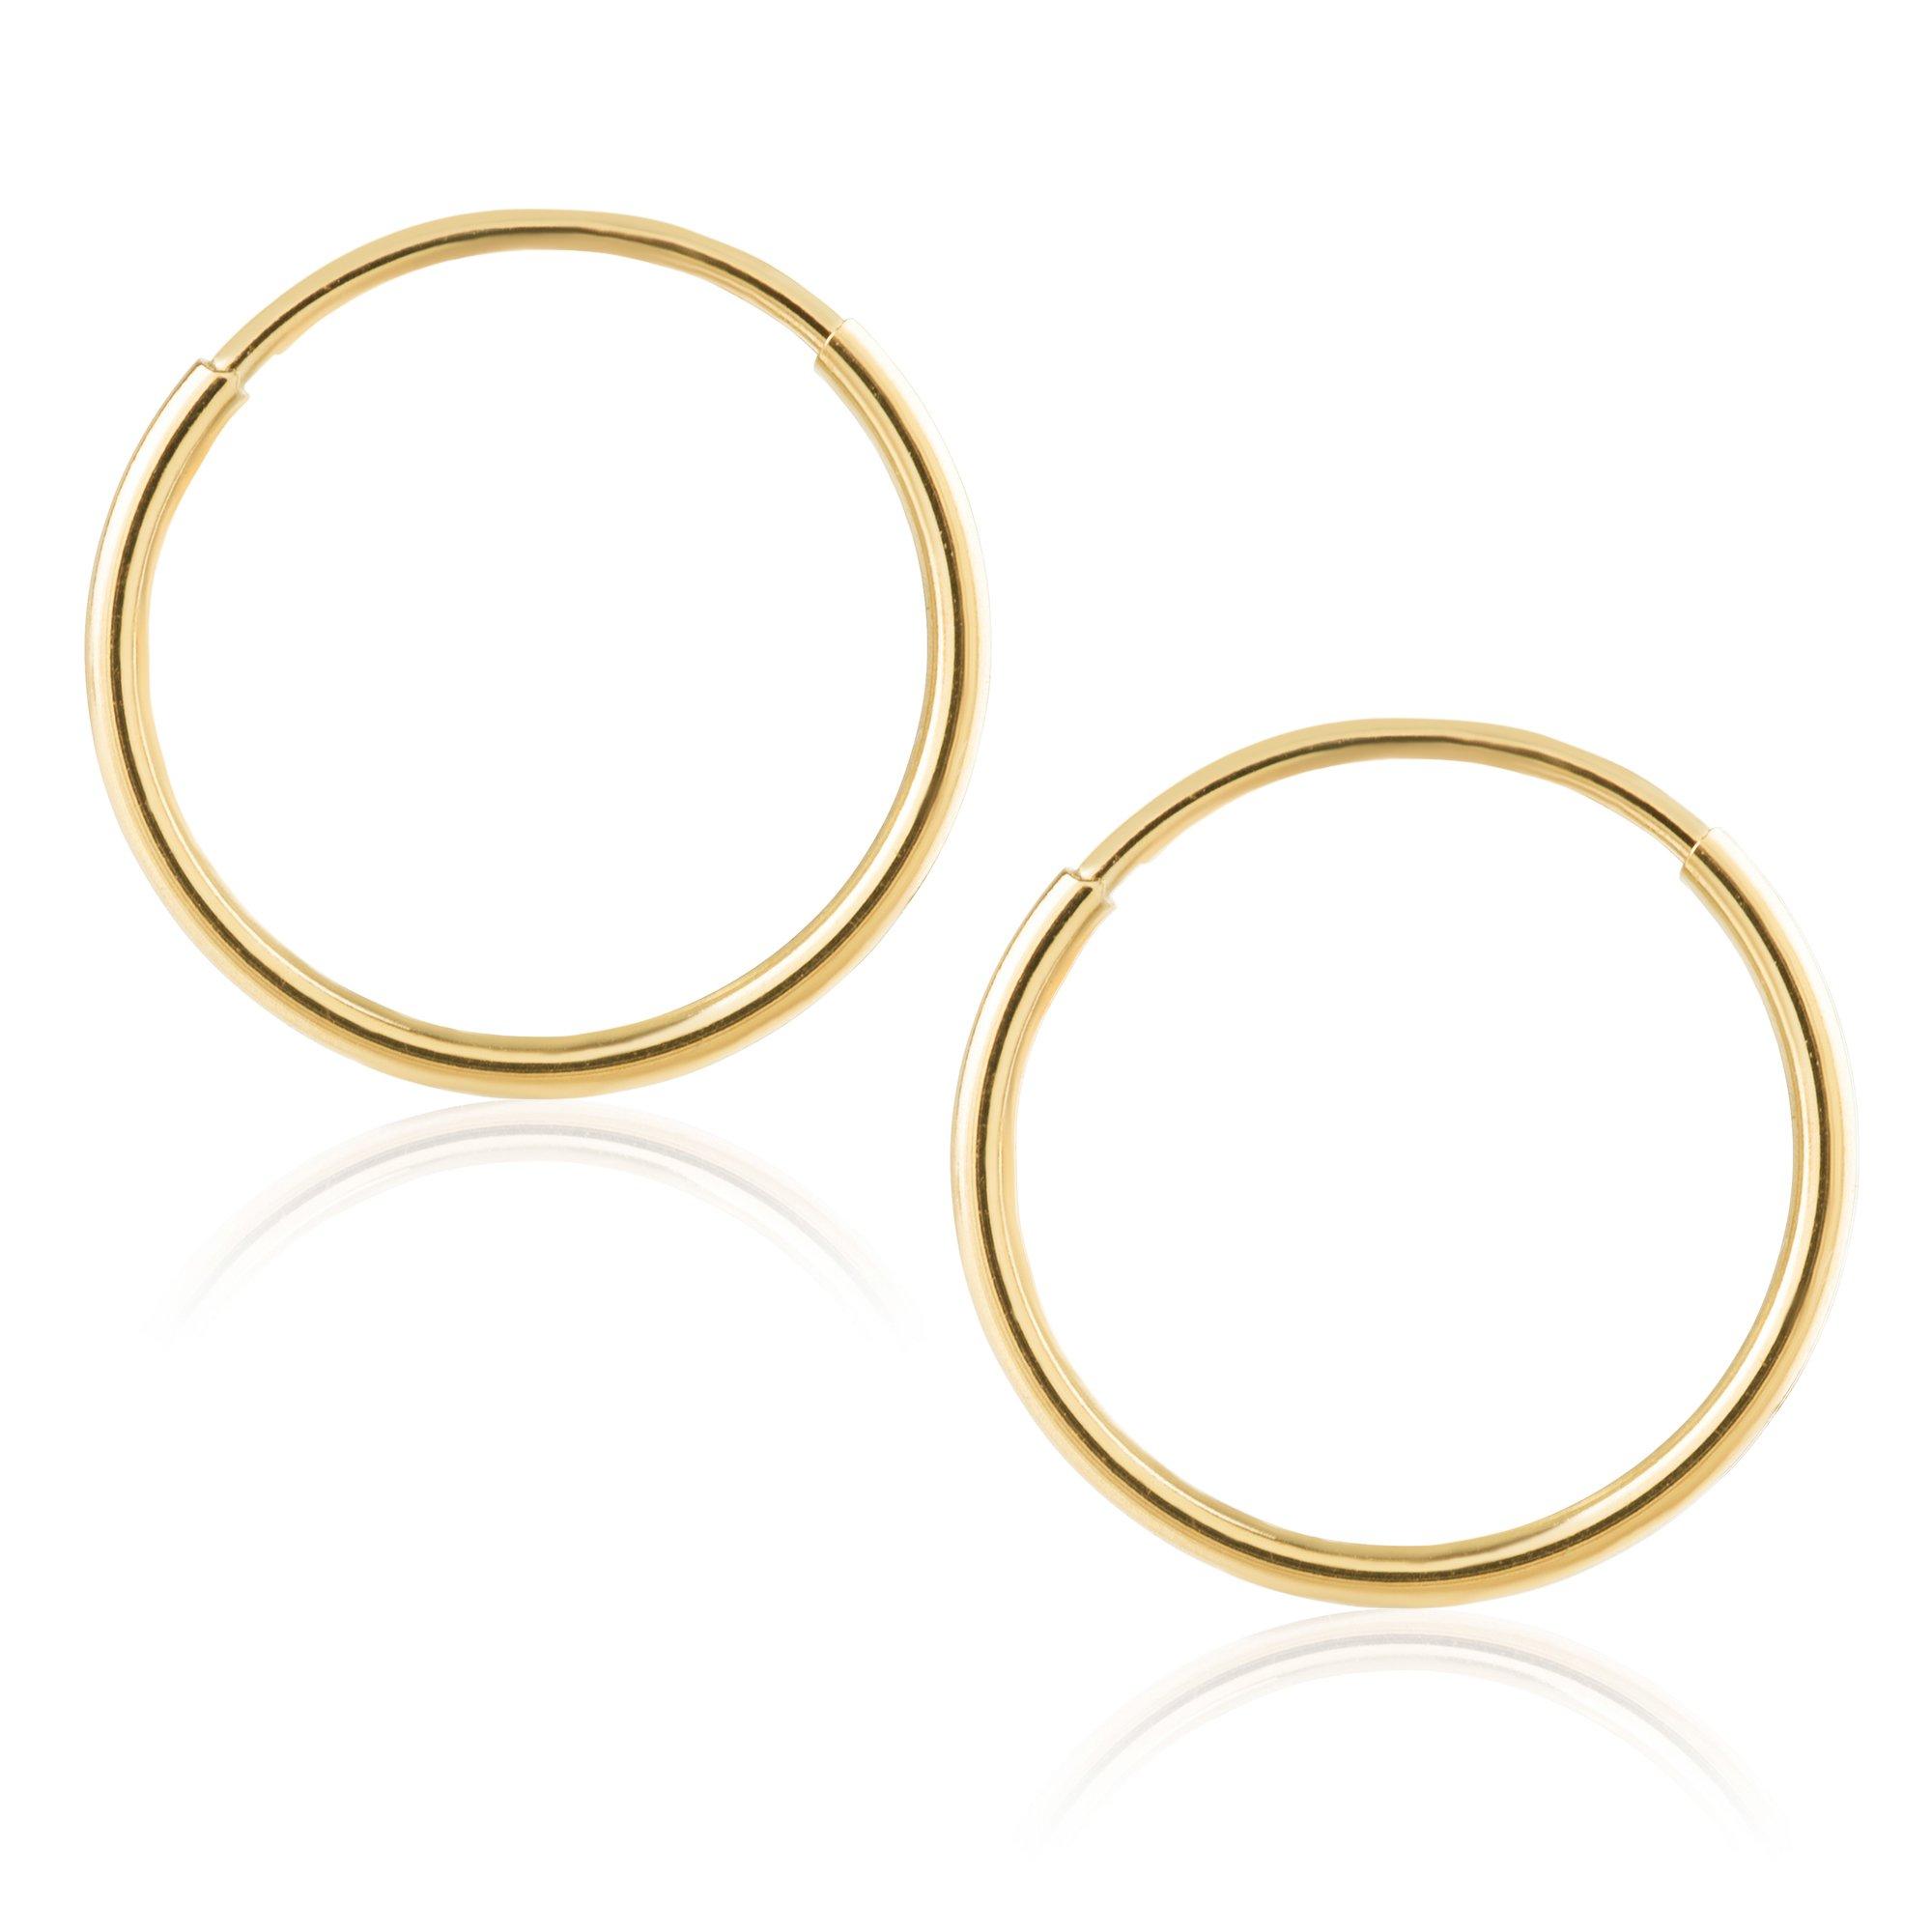 14k Yellow Gold Women's Endless Tube Hoop Earrings 1mm-1.5mm Thick 10mm - 60mm Diameter